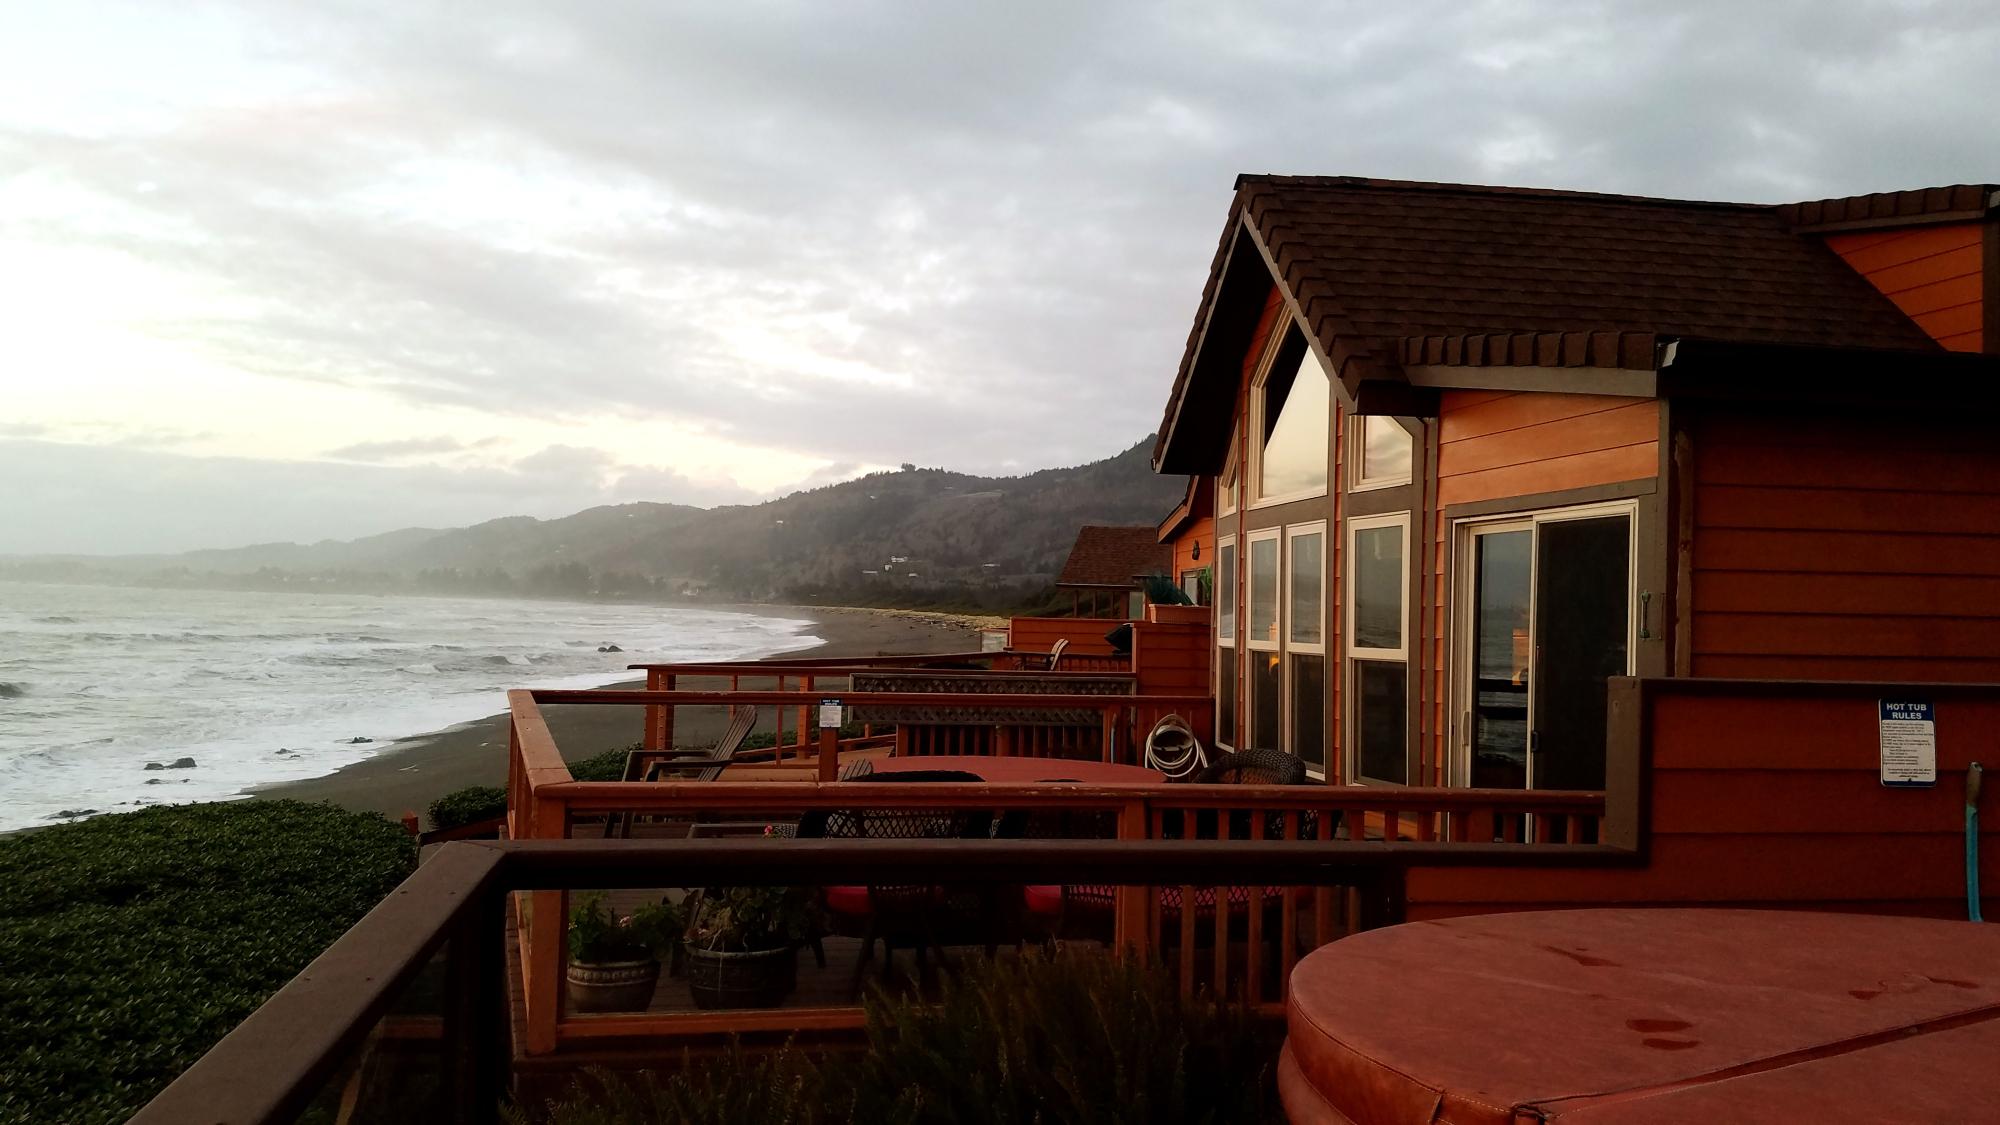 family cabin rental near harris beach state park california